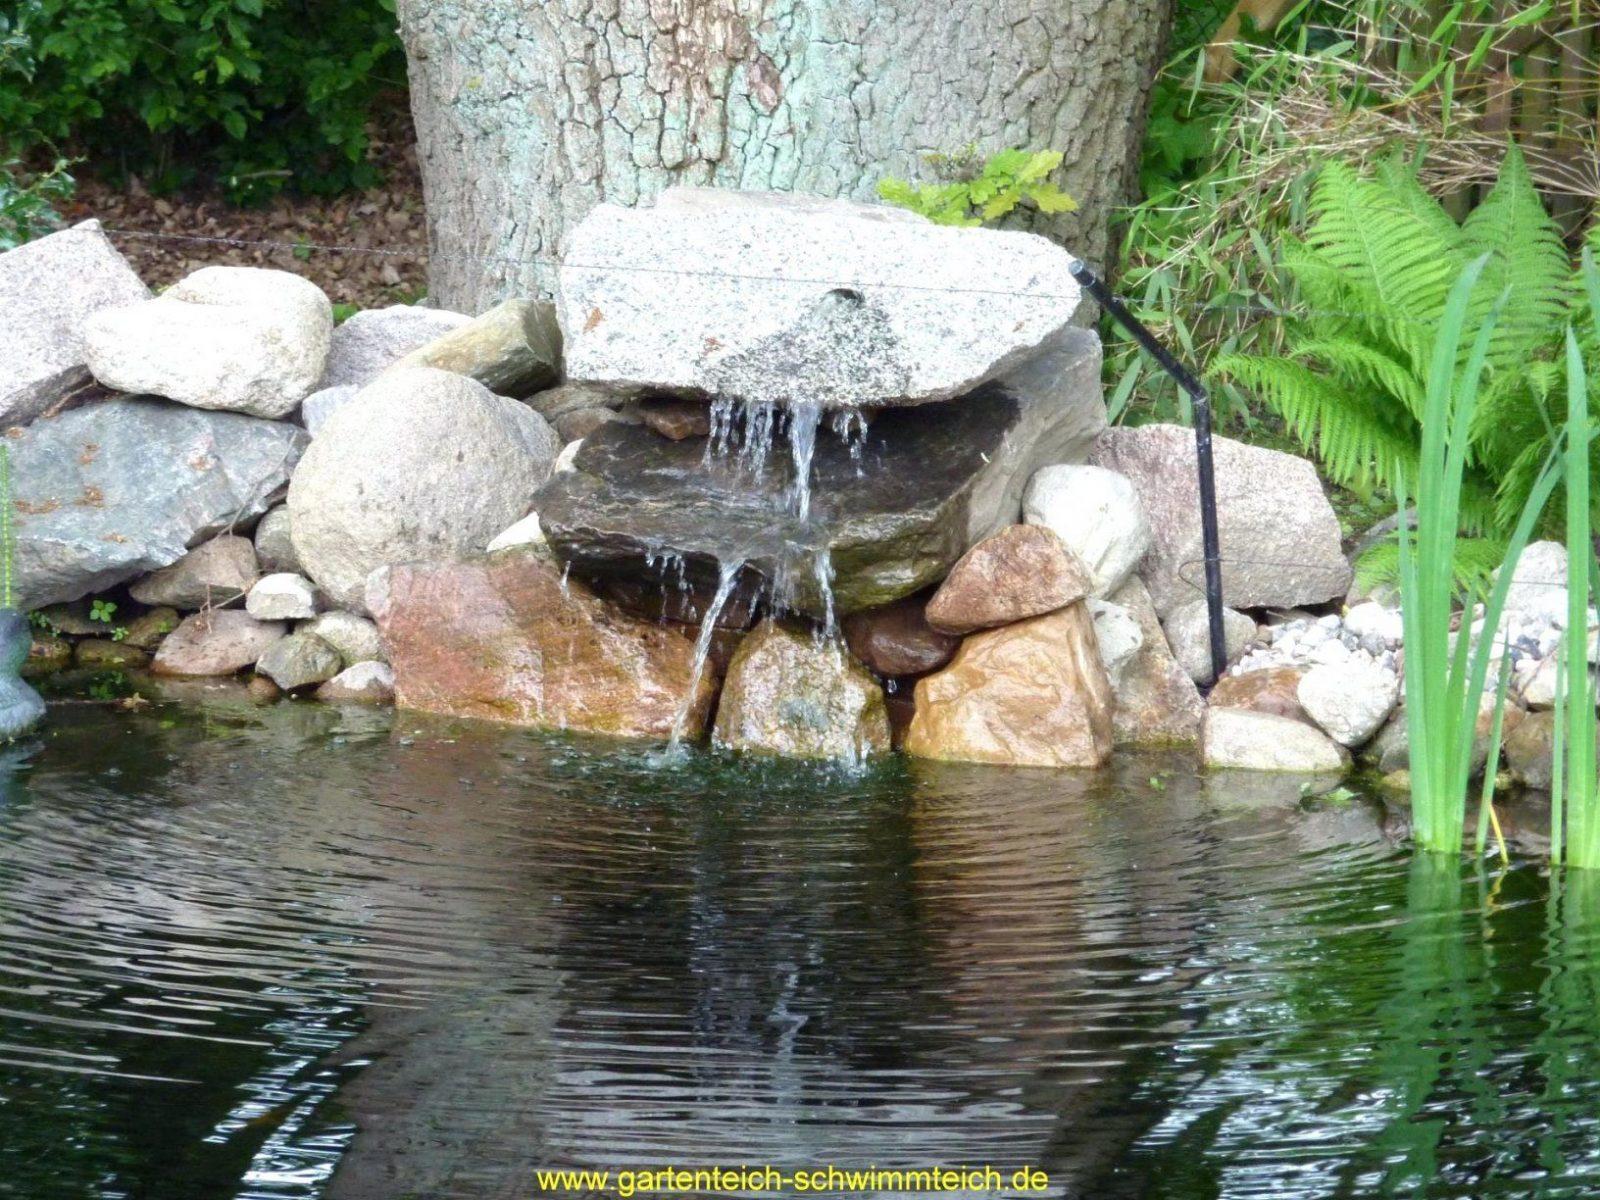 Garten wasserfall selber bauen bachlauf fr gartenteich for Wasserfall gartenteich